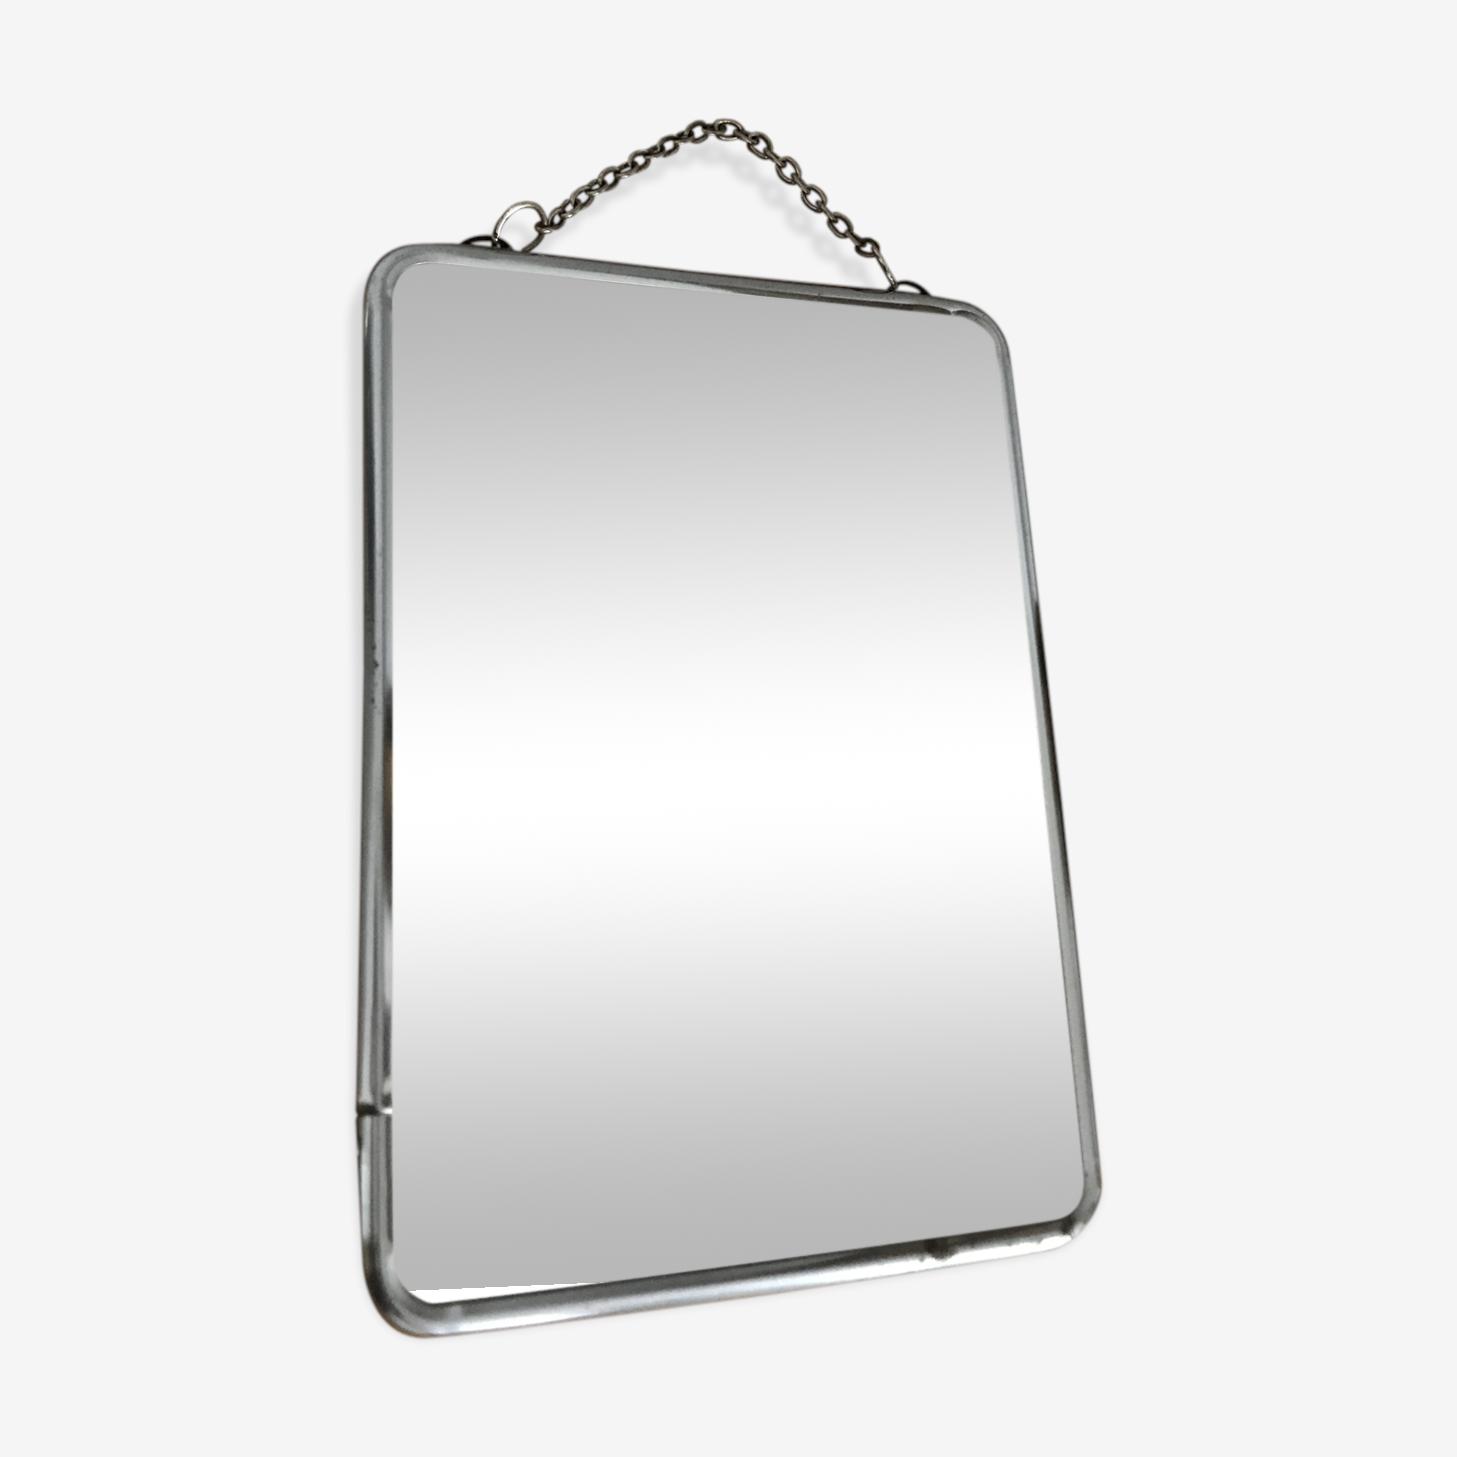 Barber mirror 15x21cm